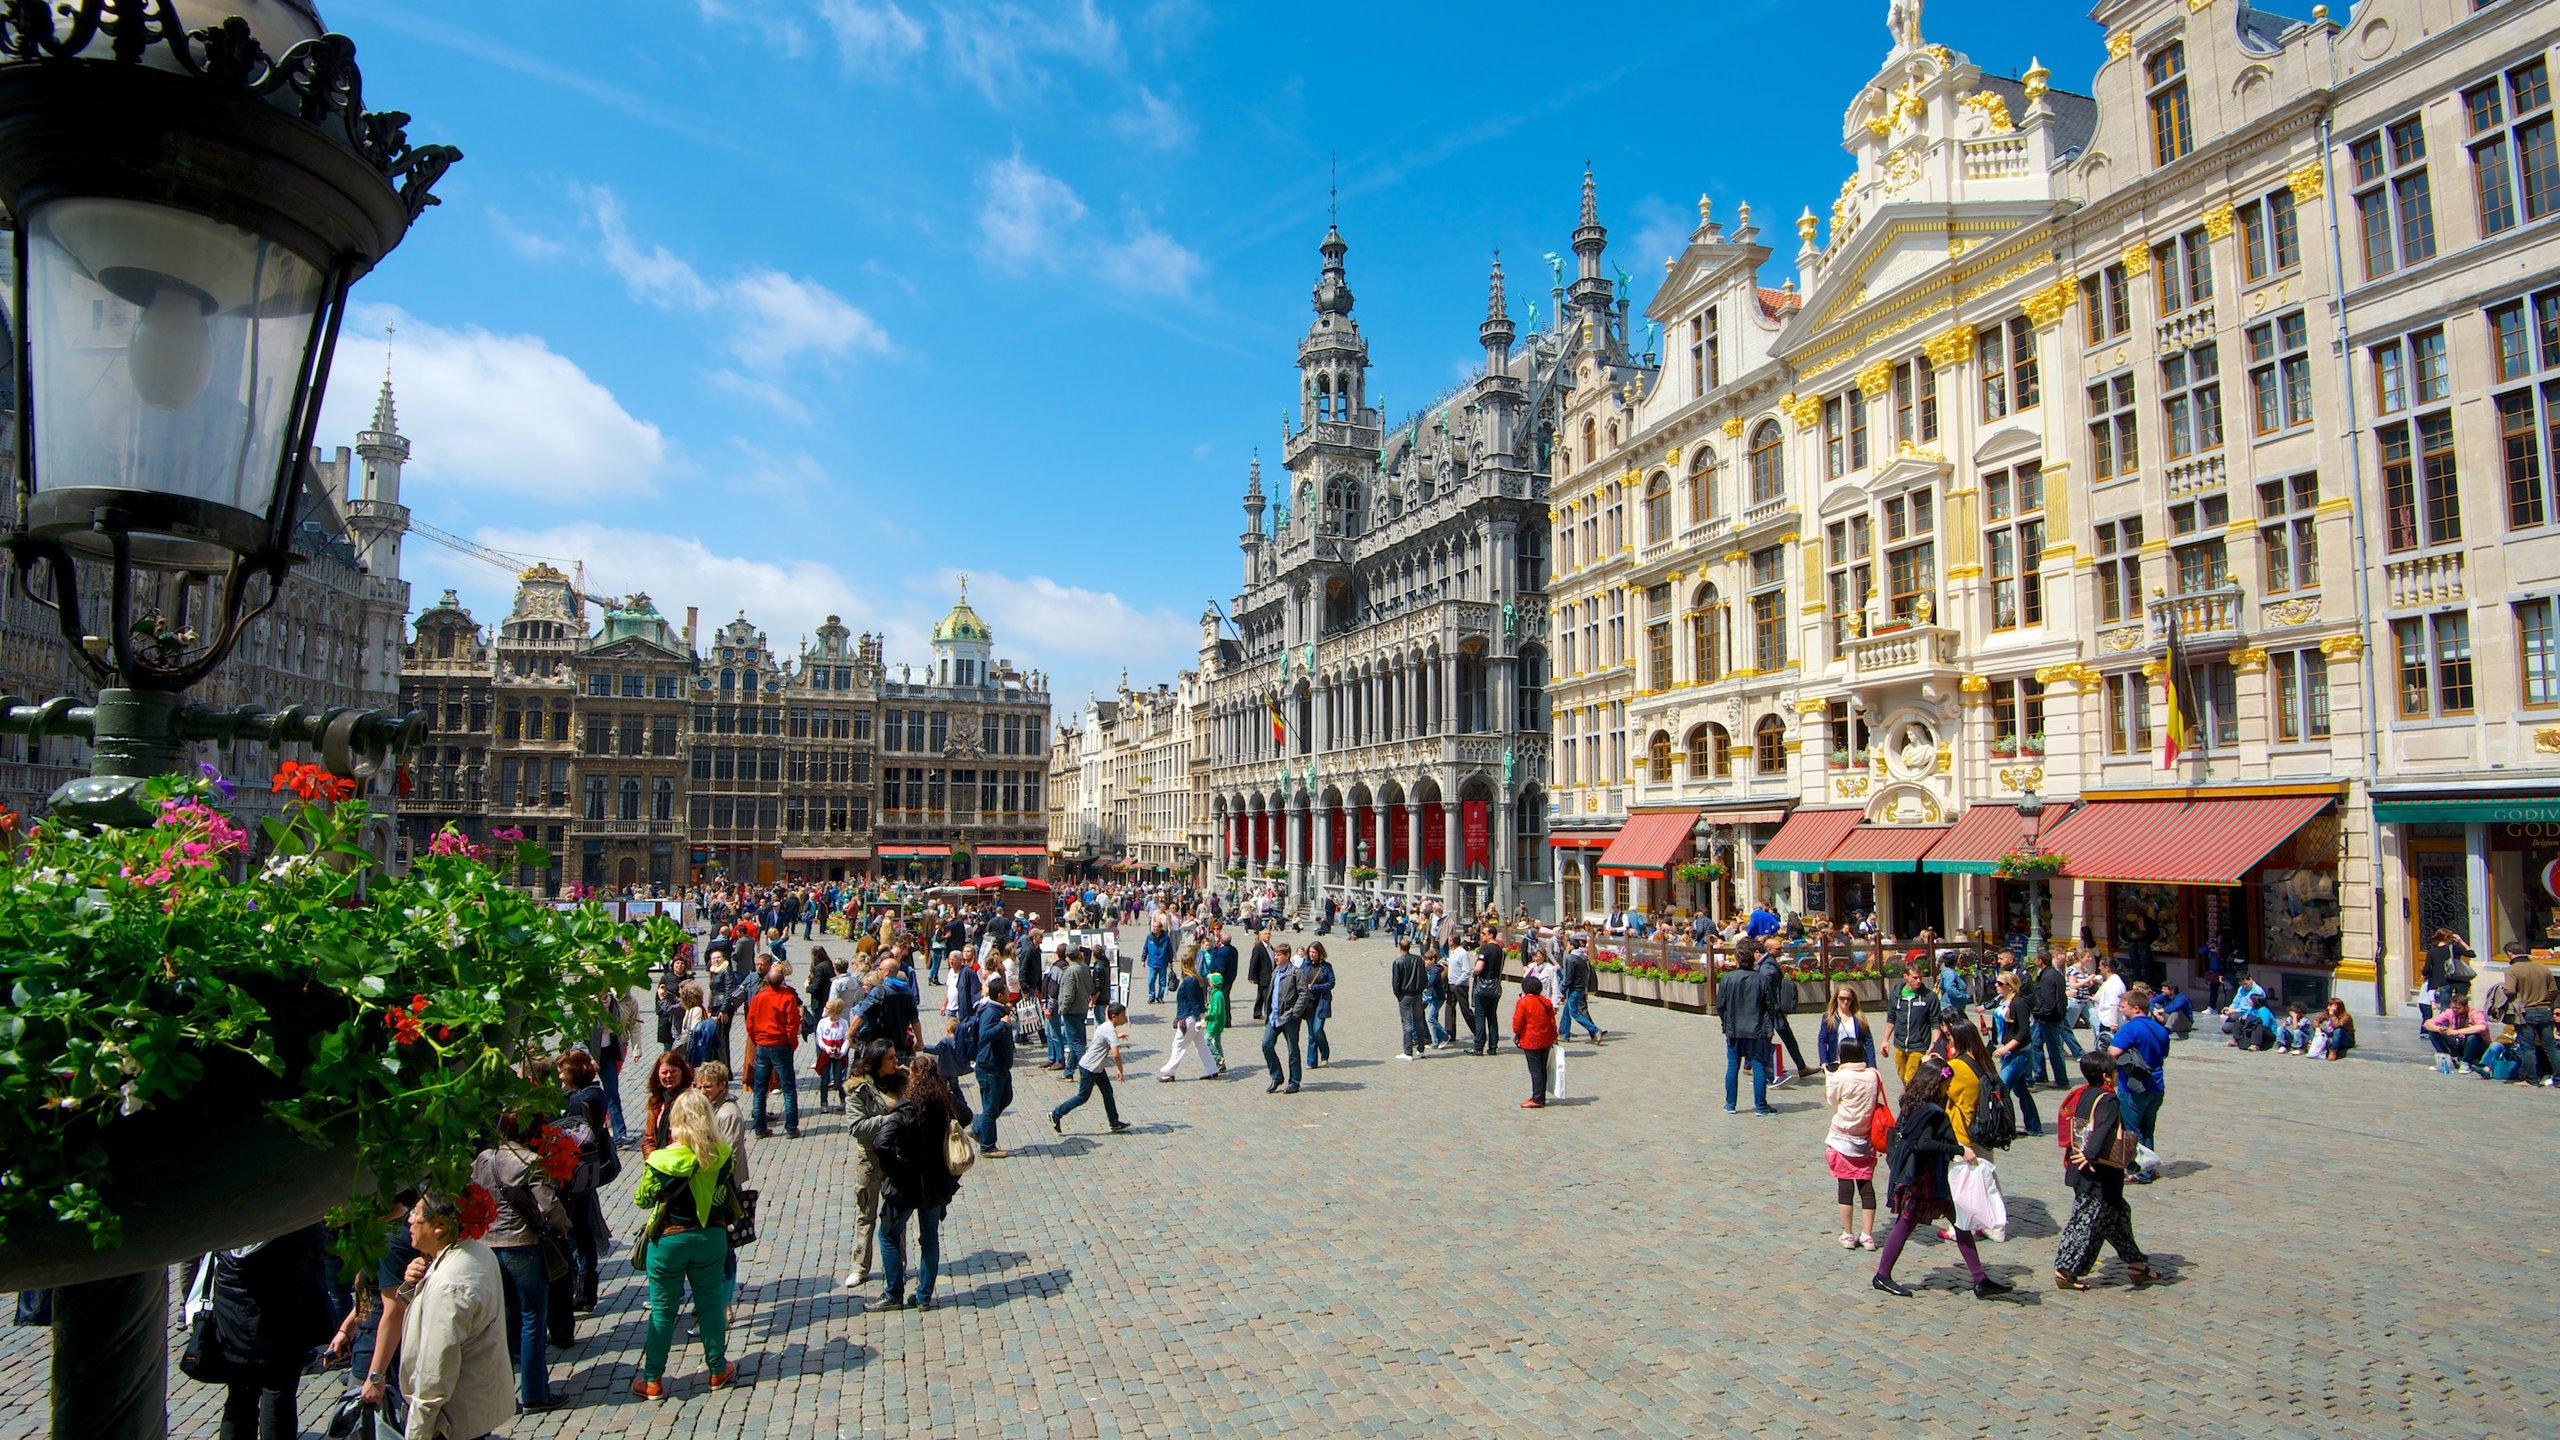 Brüssel (und Umgebung), Bezirk Flandern, Belgien